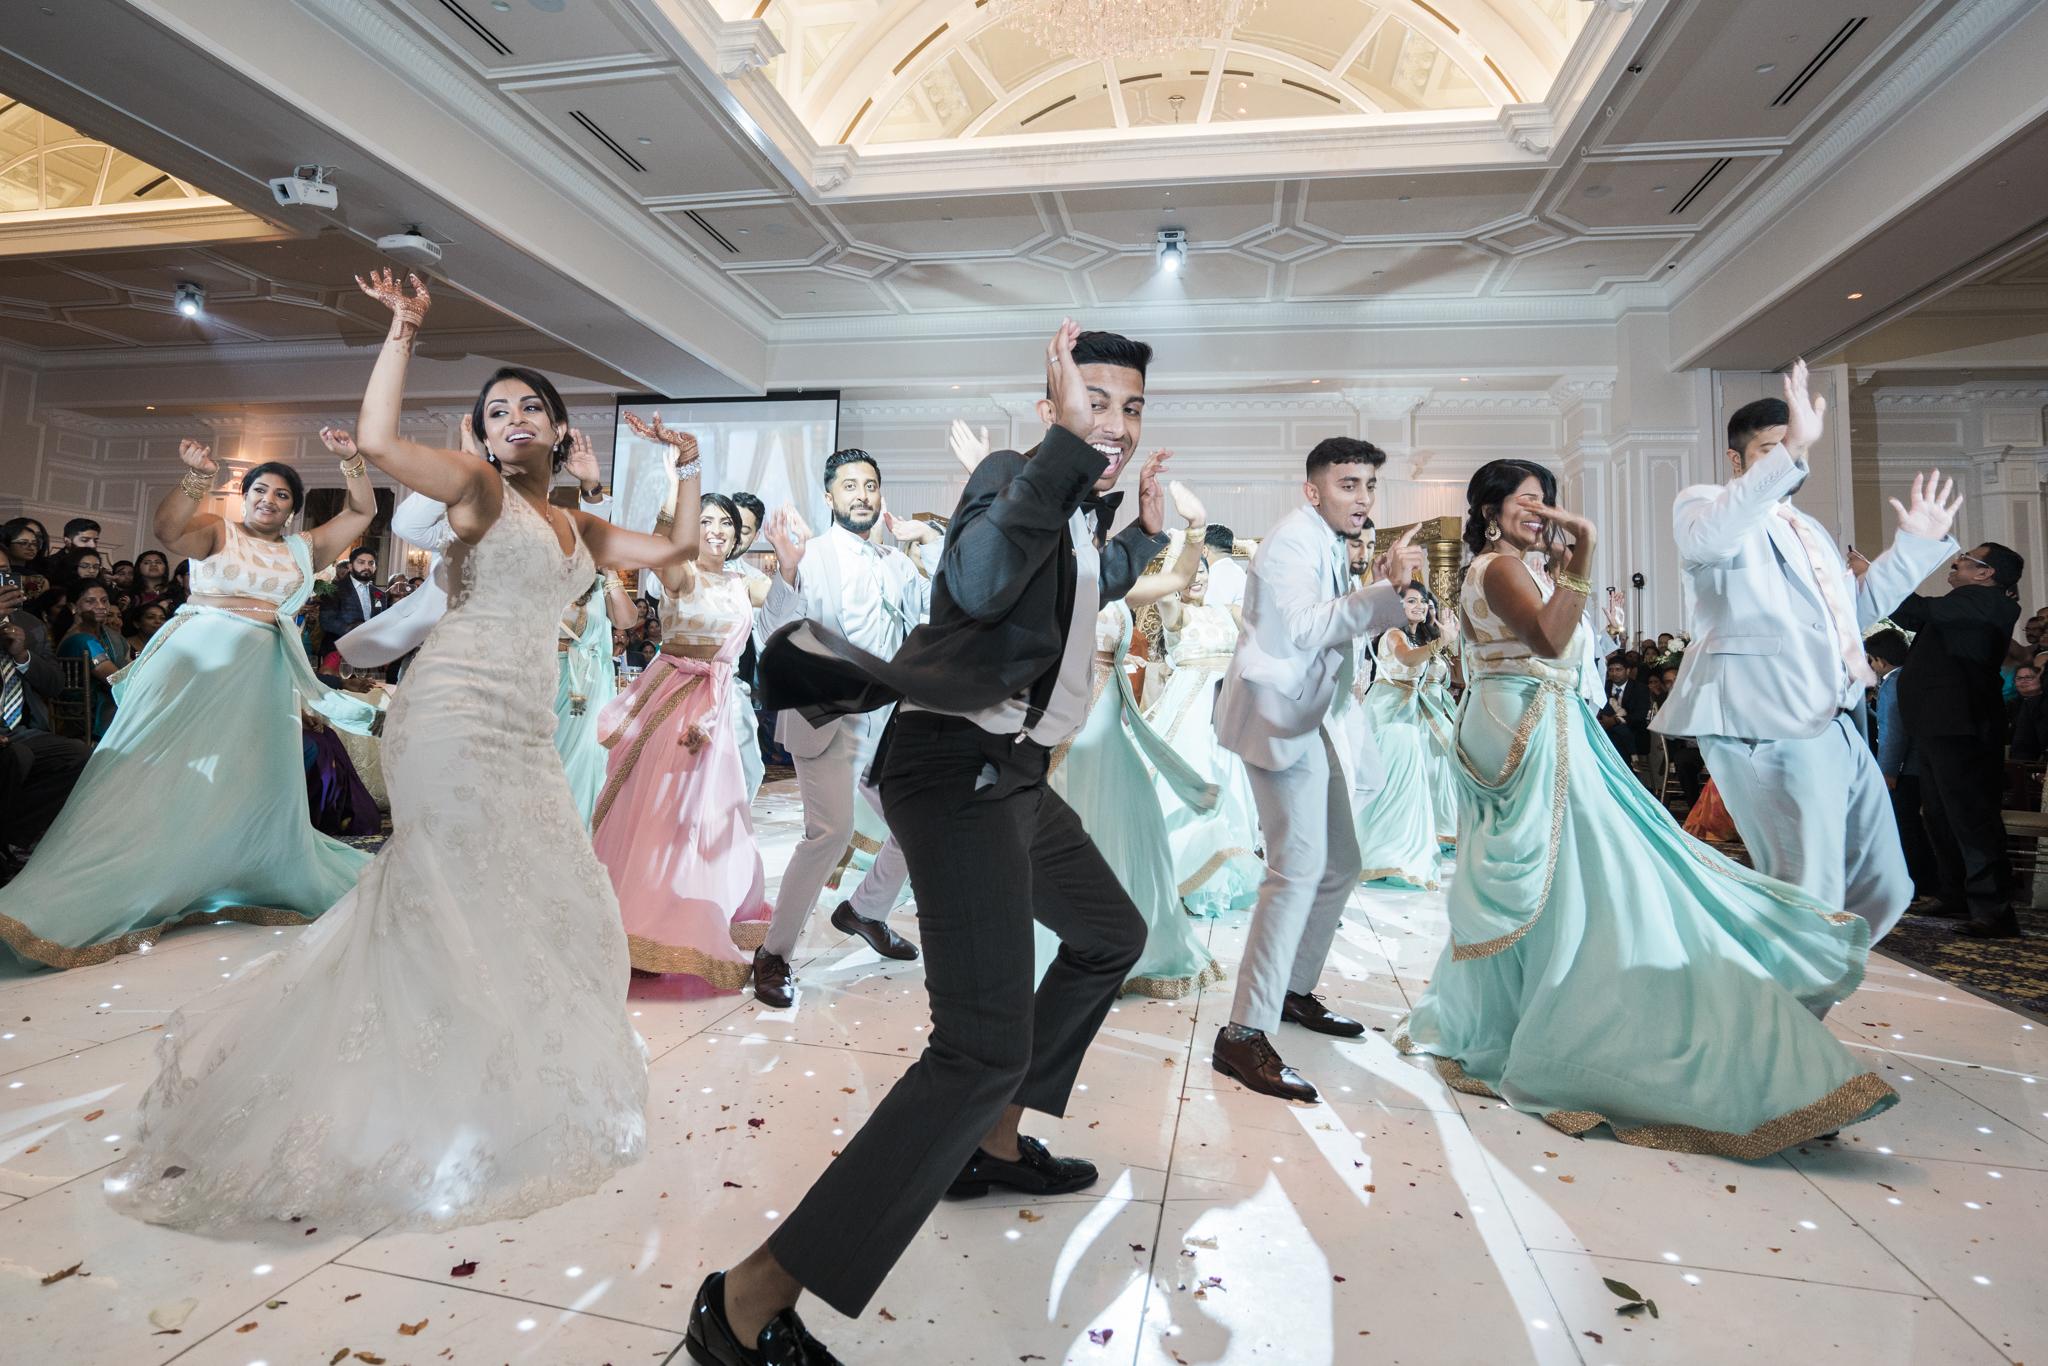 Legacy Wedding (8 of 11).jpg